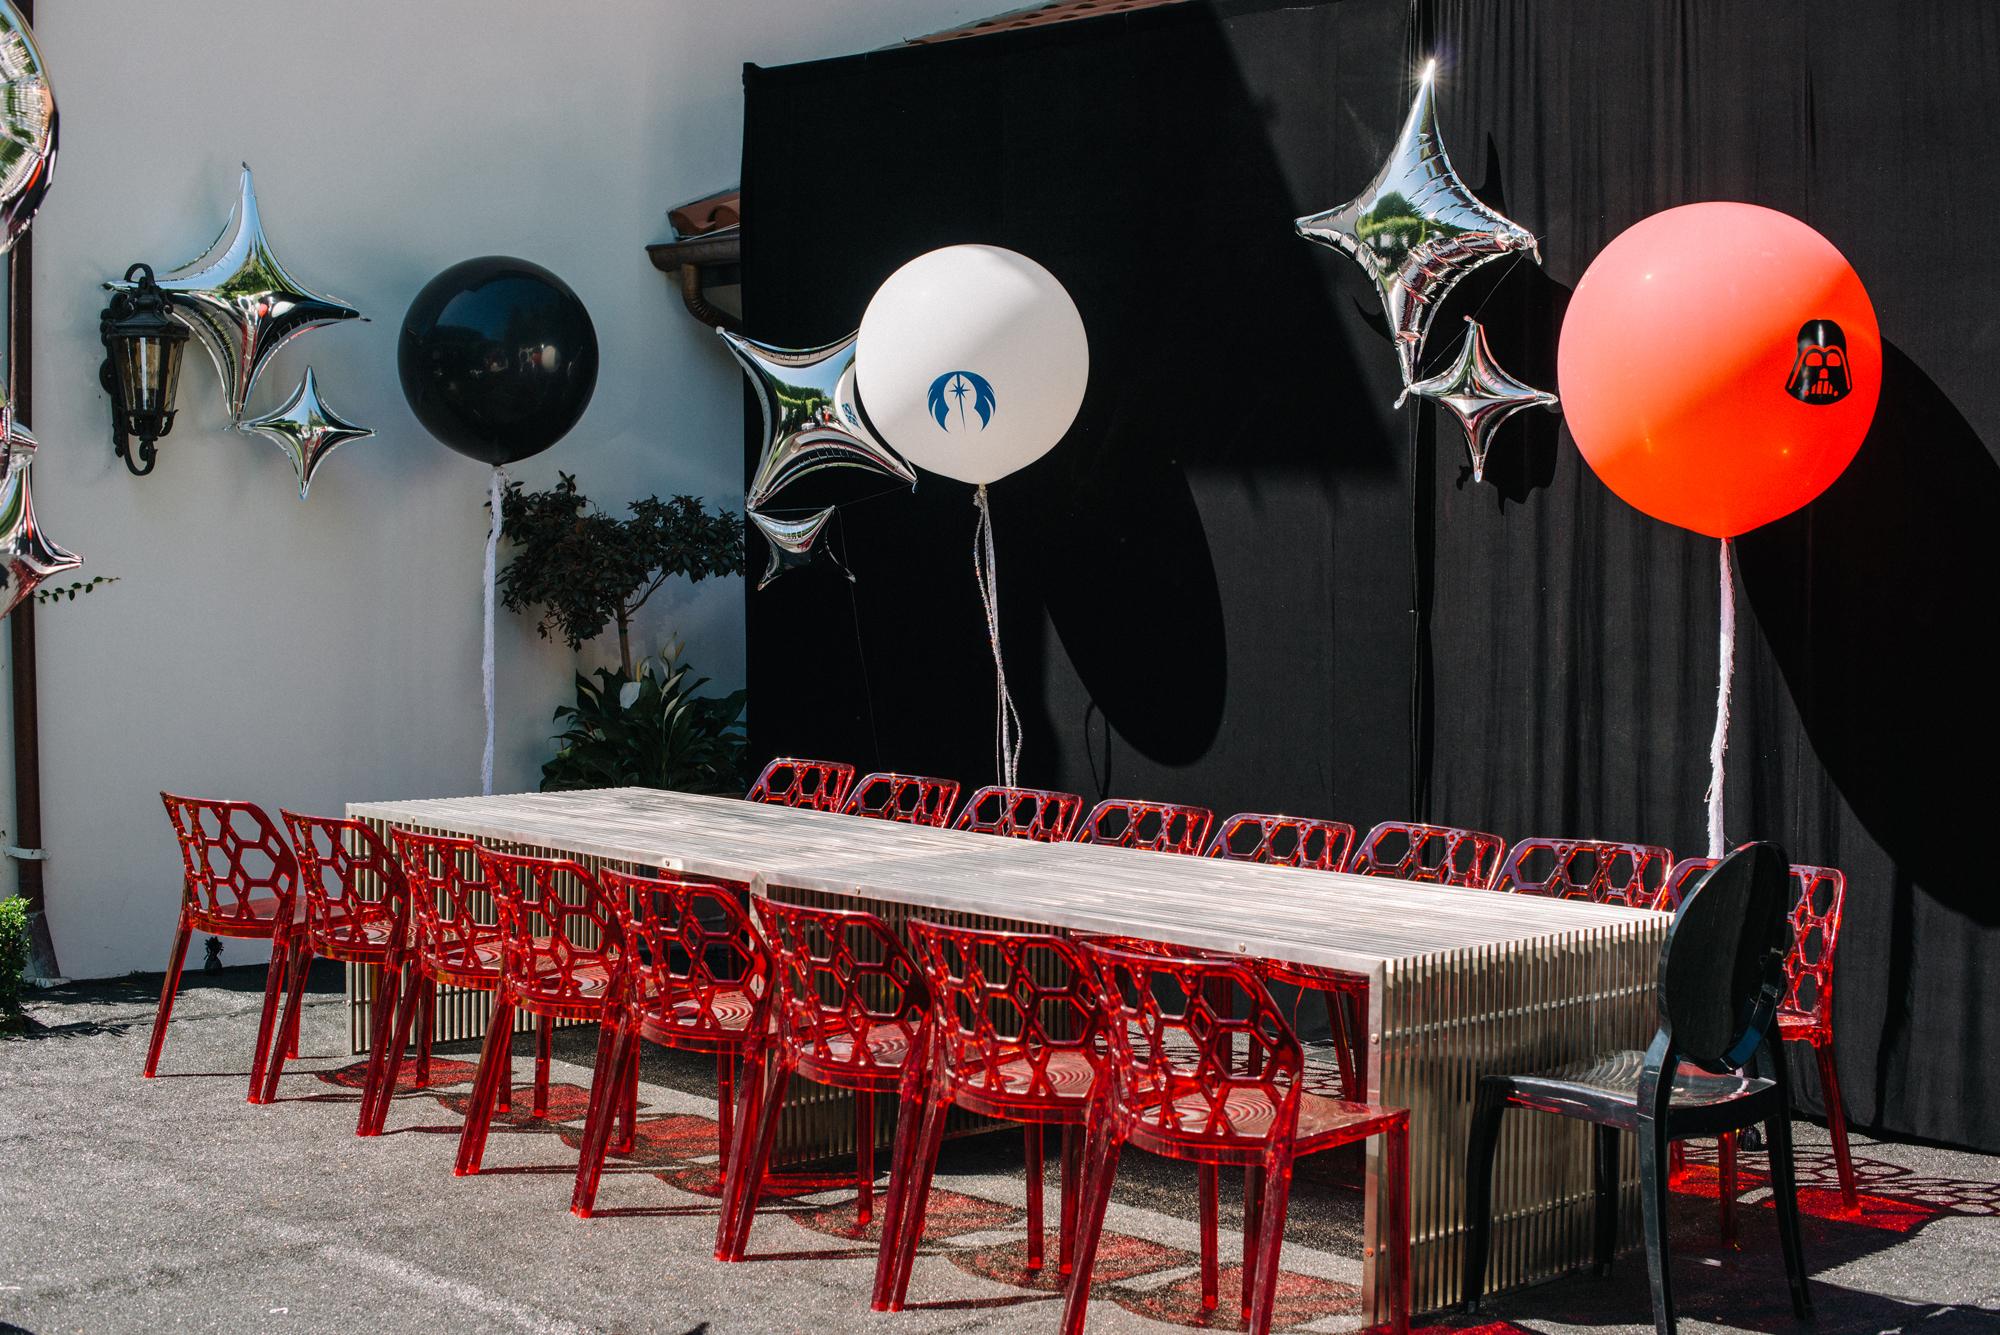 tarynco-events-starwars-themed-kids-birthday-party-kidstable.jpg